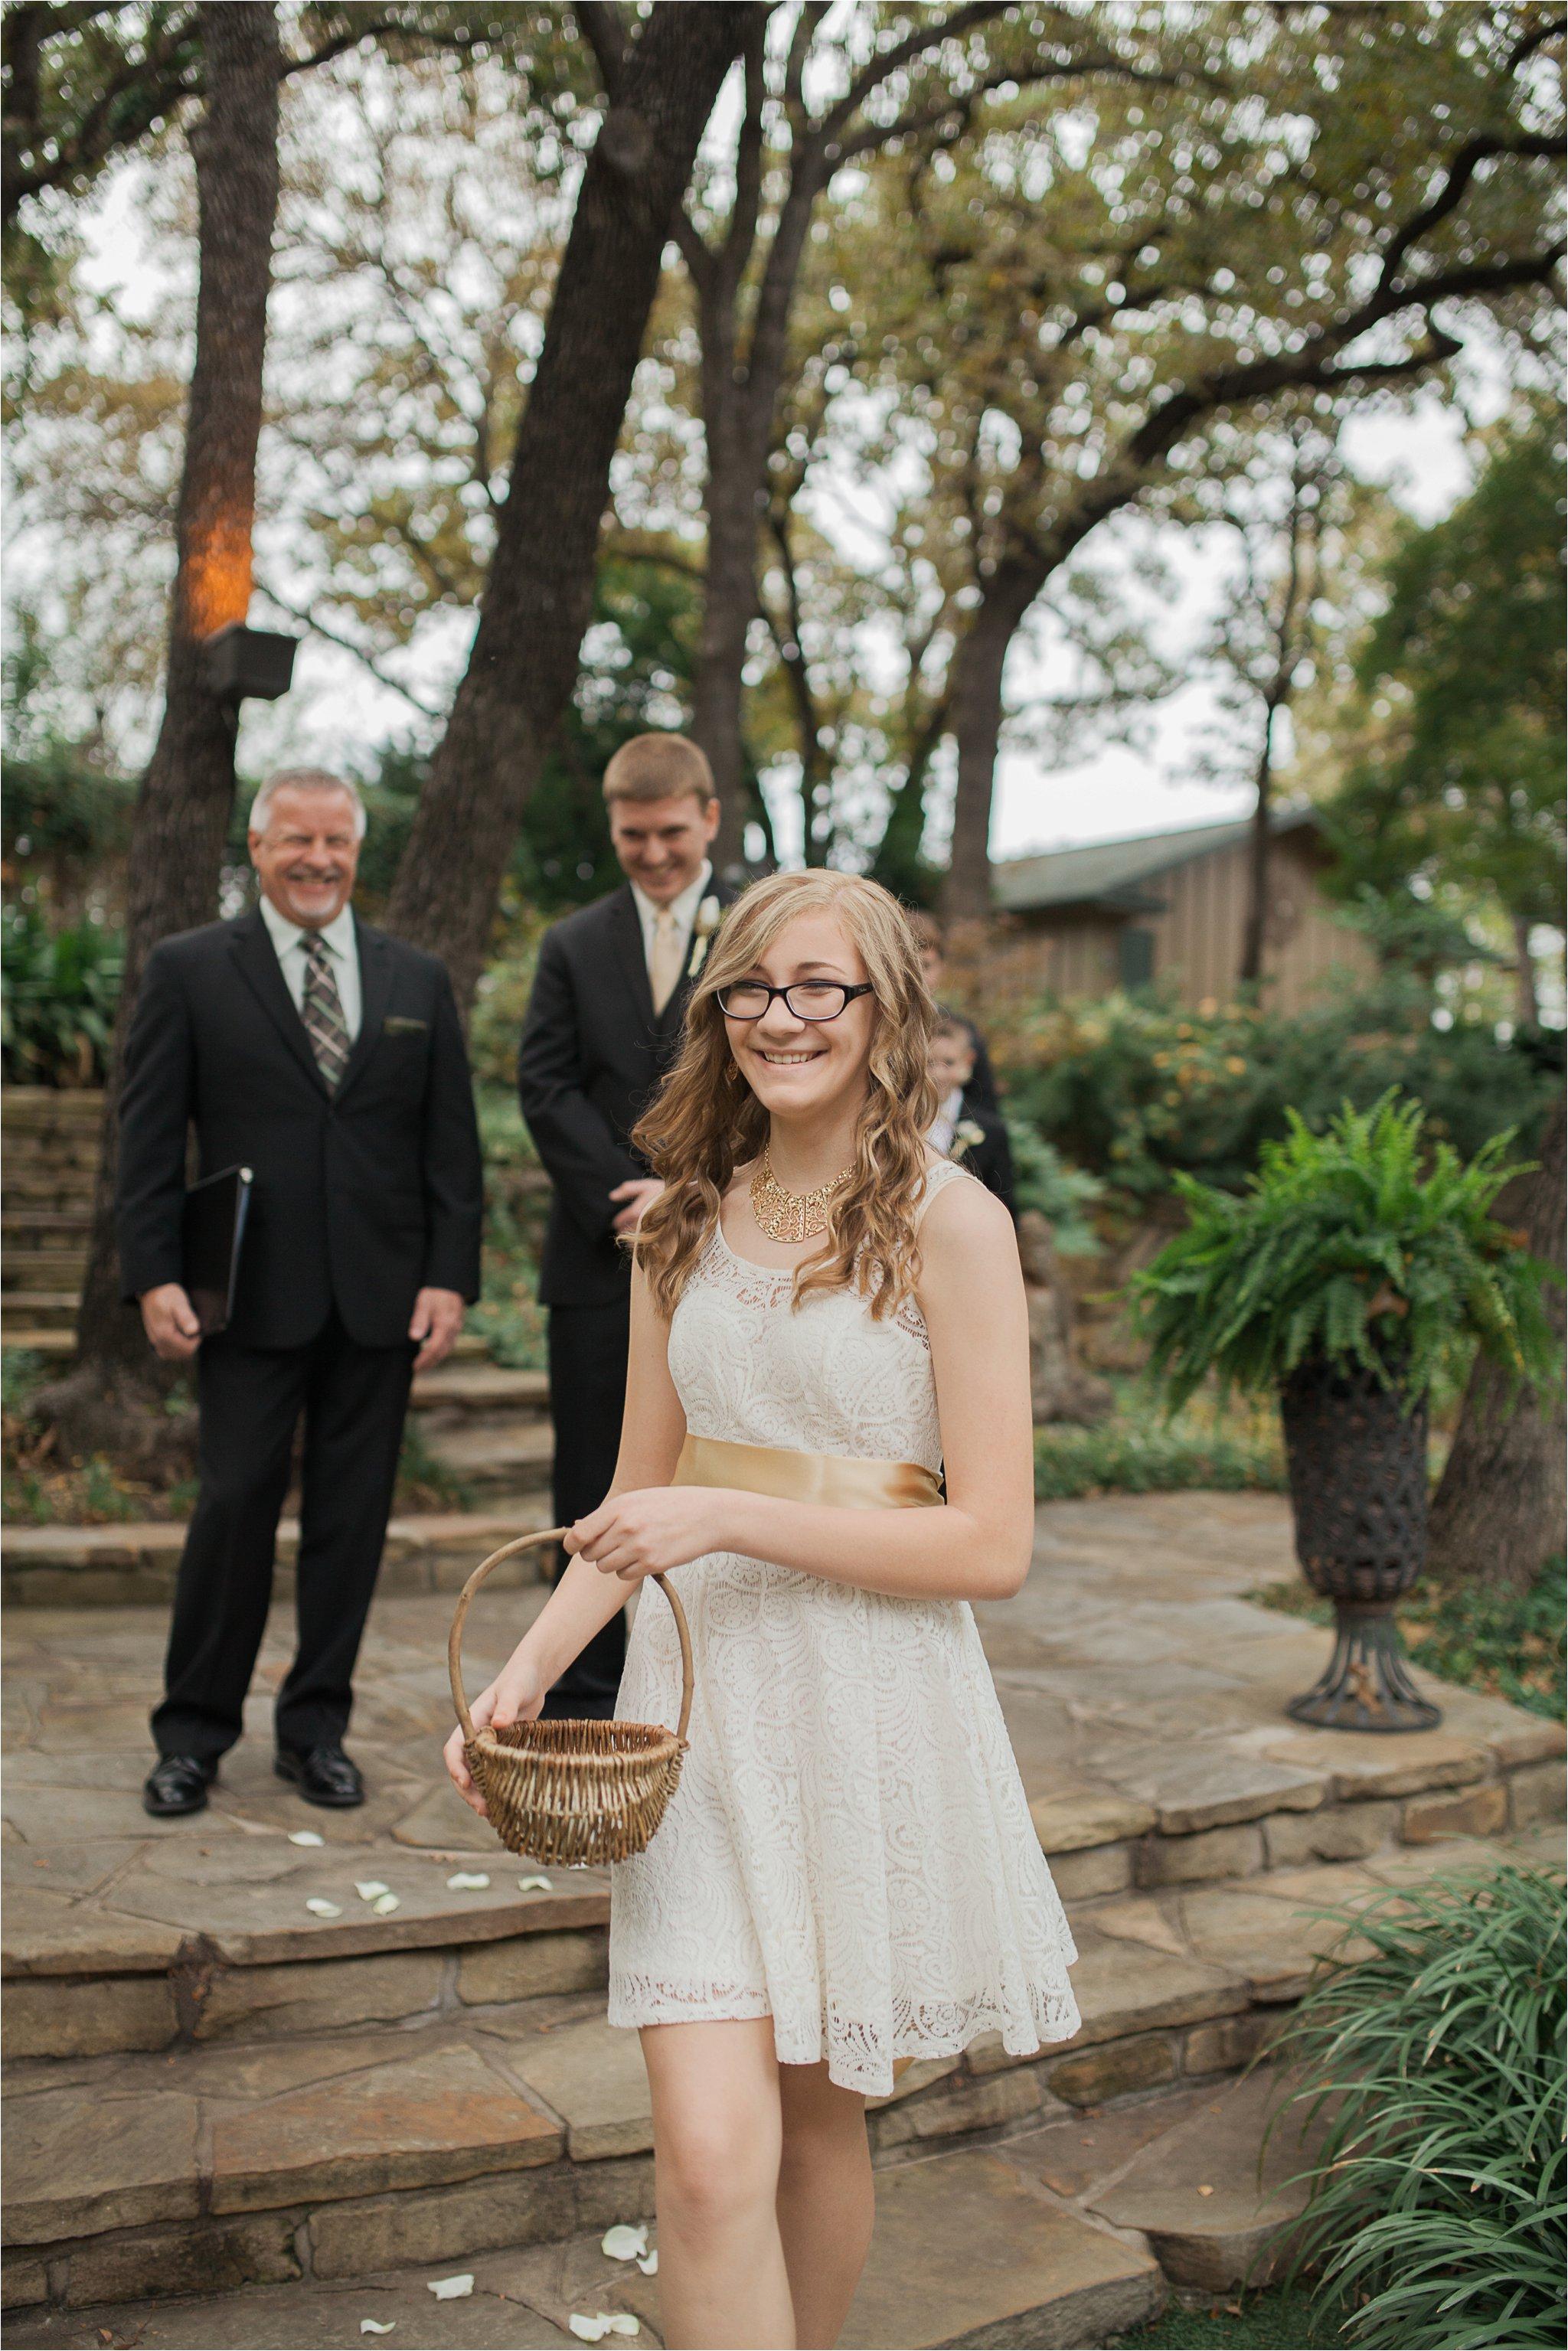 lunsford-wedding-503.jpg